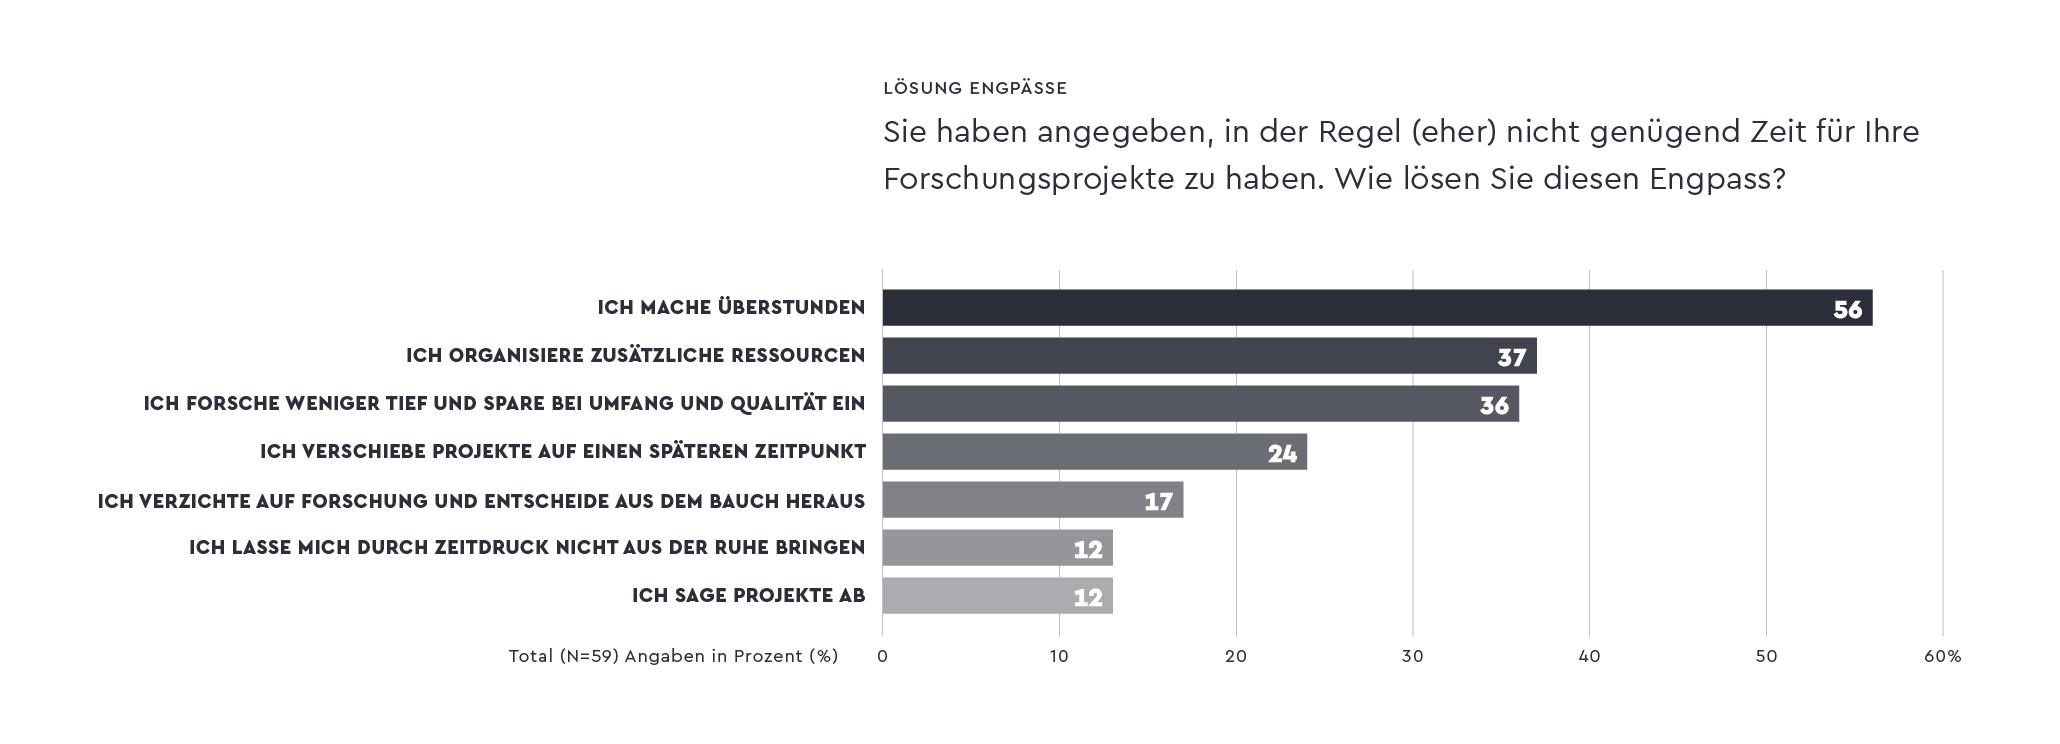 insights-report-2021-engpaesse